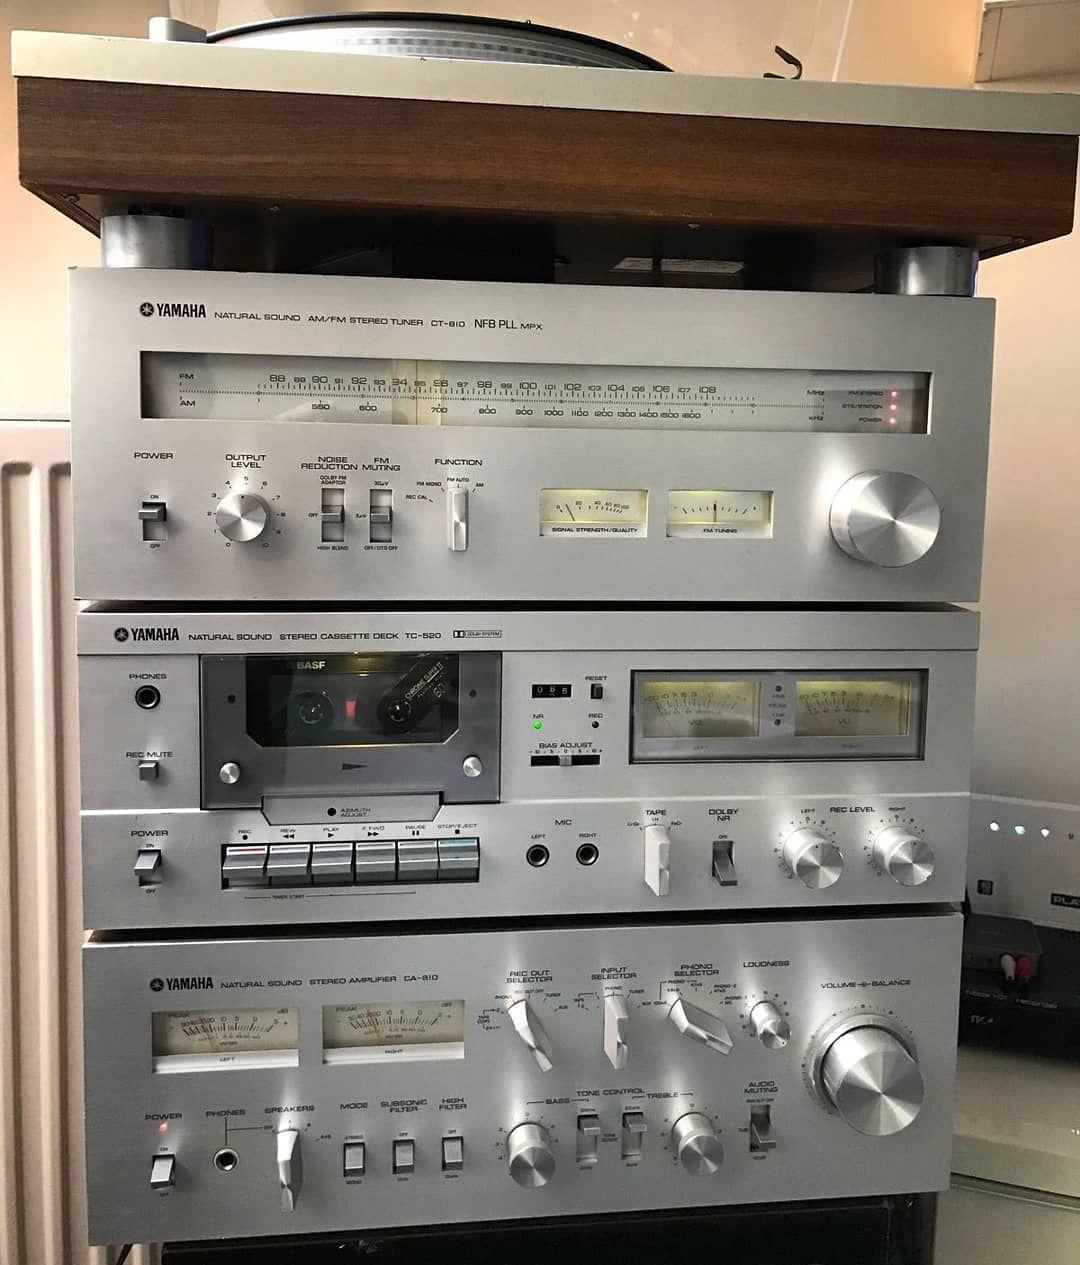 Yamaha Vintage Setup Yamaha Audio Audiophile Analogaudio Hifi Hifiaudio Hiend Hobby Vintageaudio Vintageamplifi Yamaha Audio Hifi Audio Yamaha Hi Fi